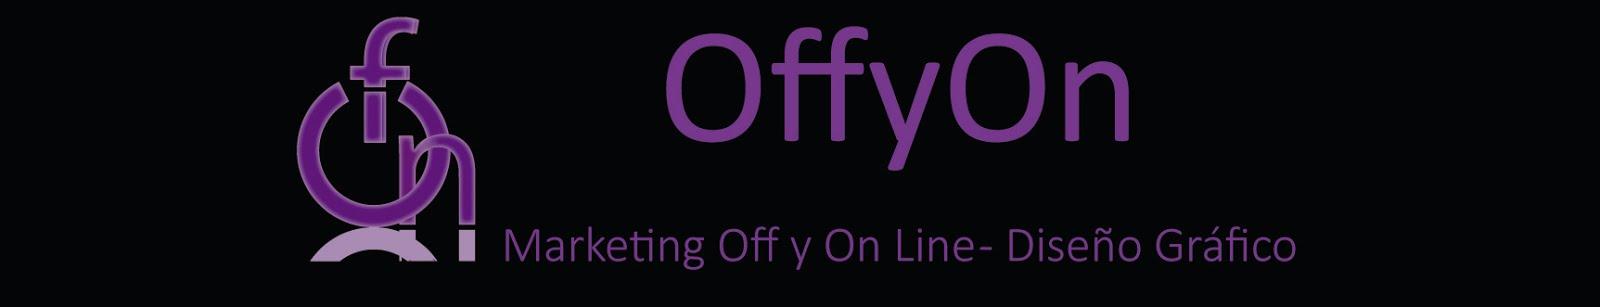 OffyOn